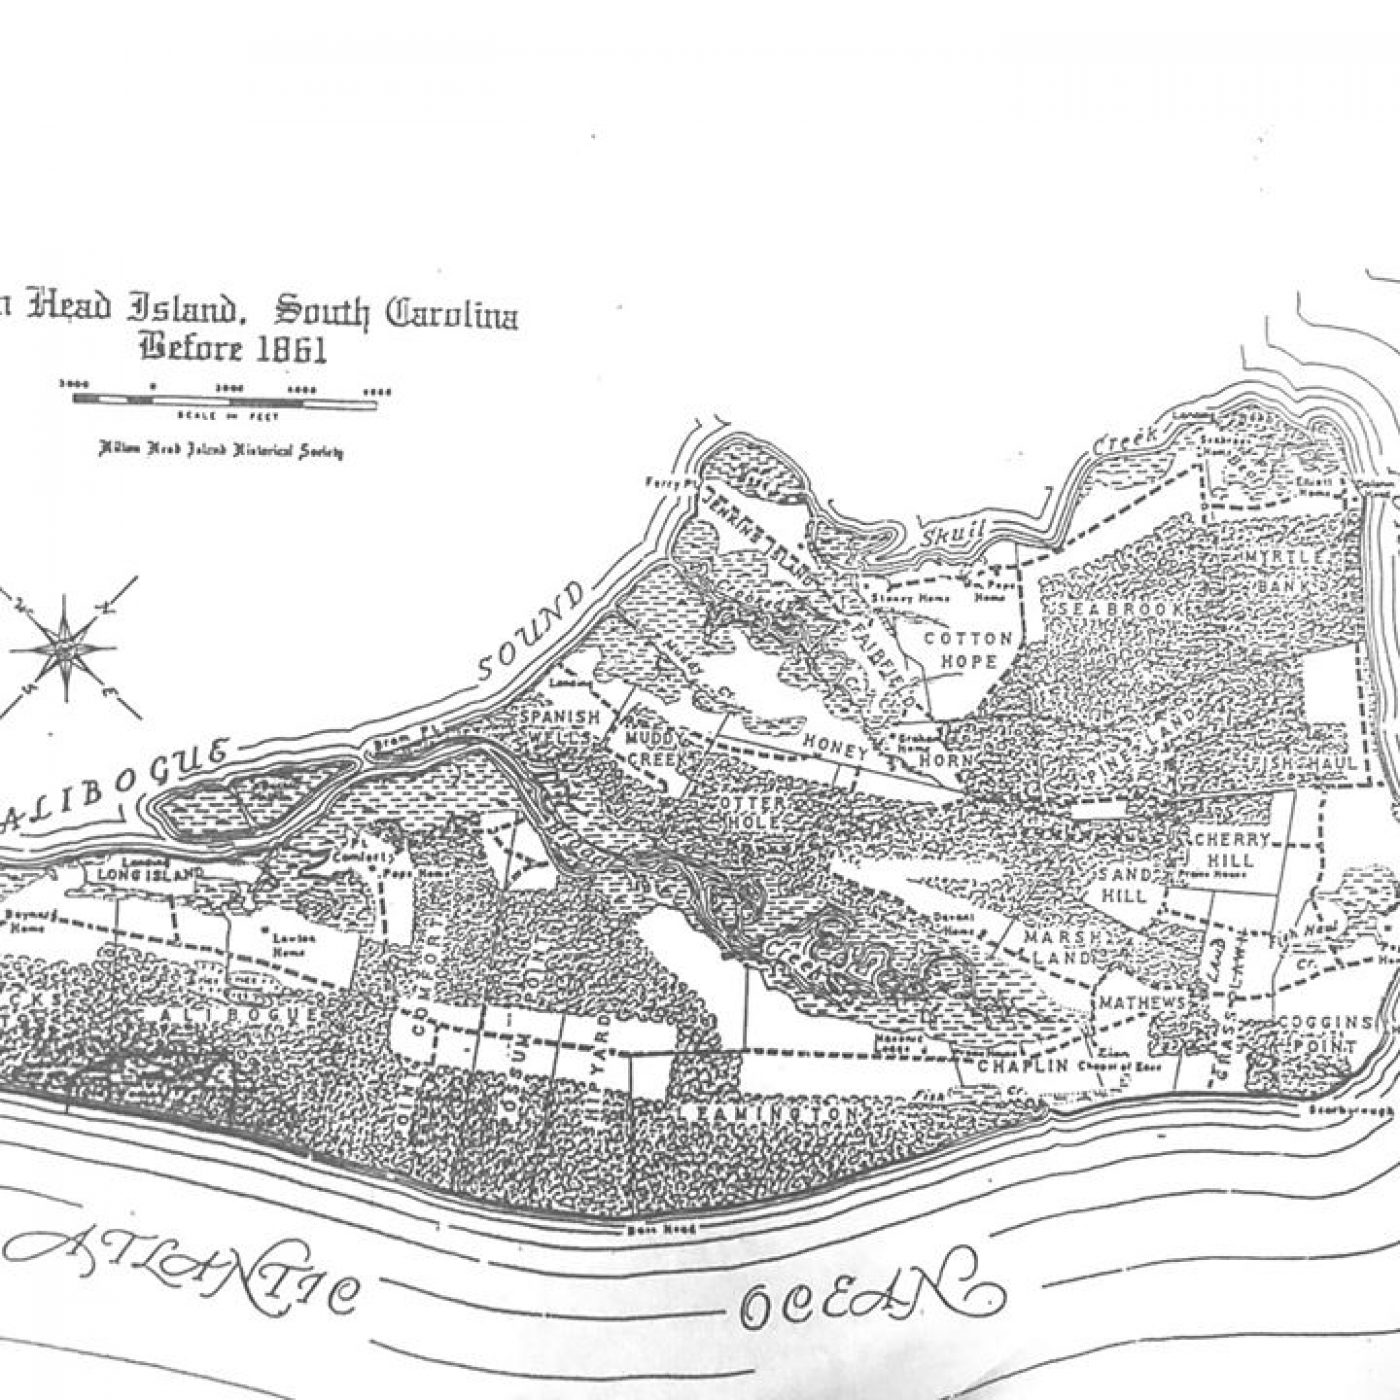 Old Hilton Head